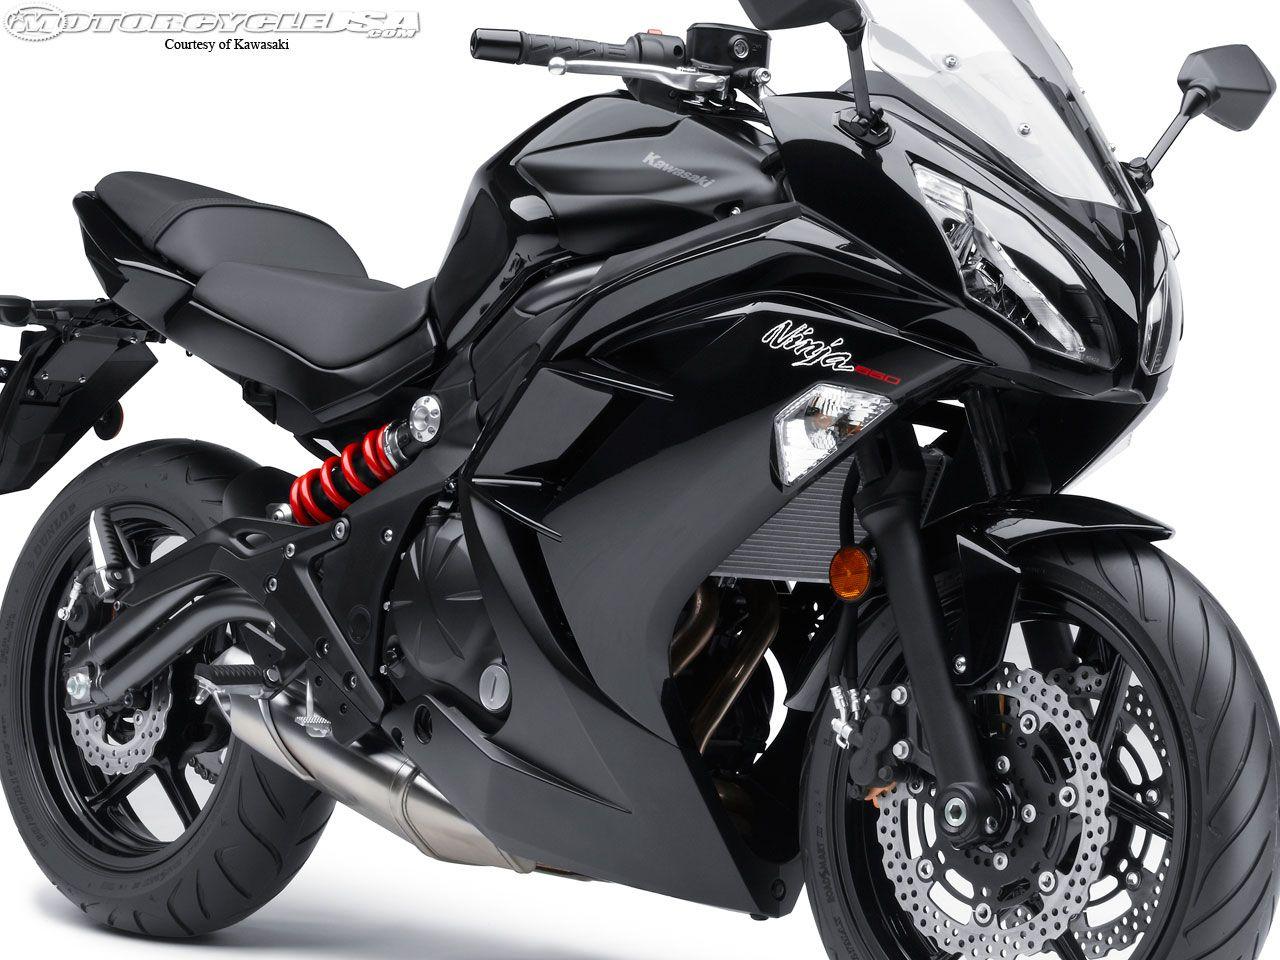 10 Best Kawasaki Ninja 650r Images On Pinterest